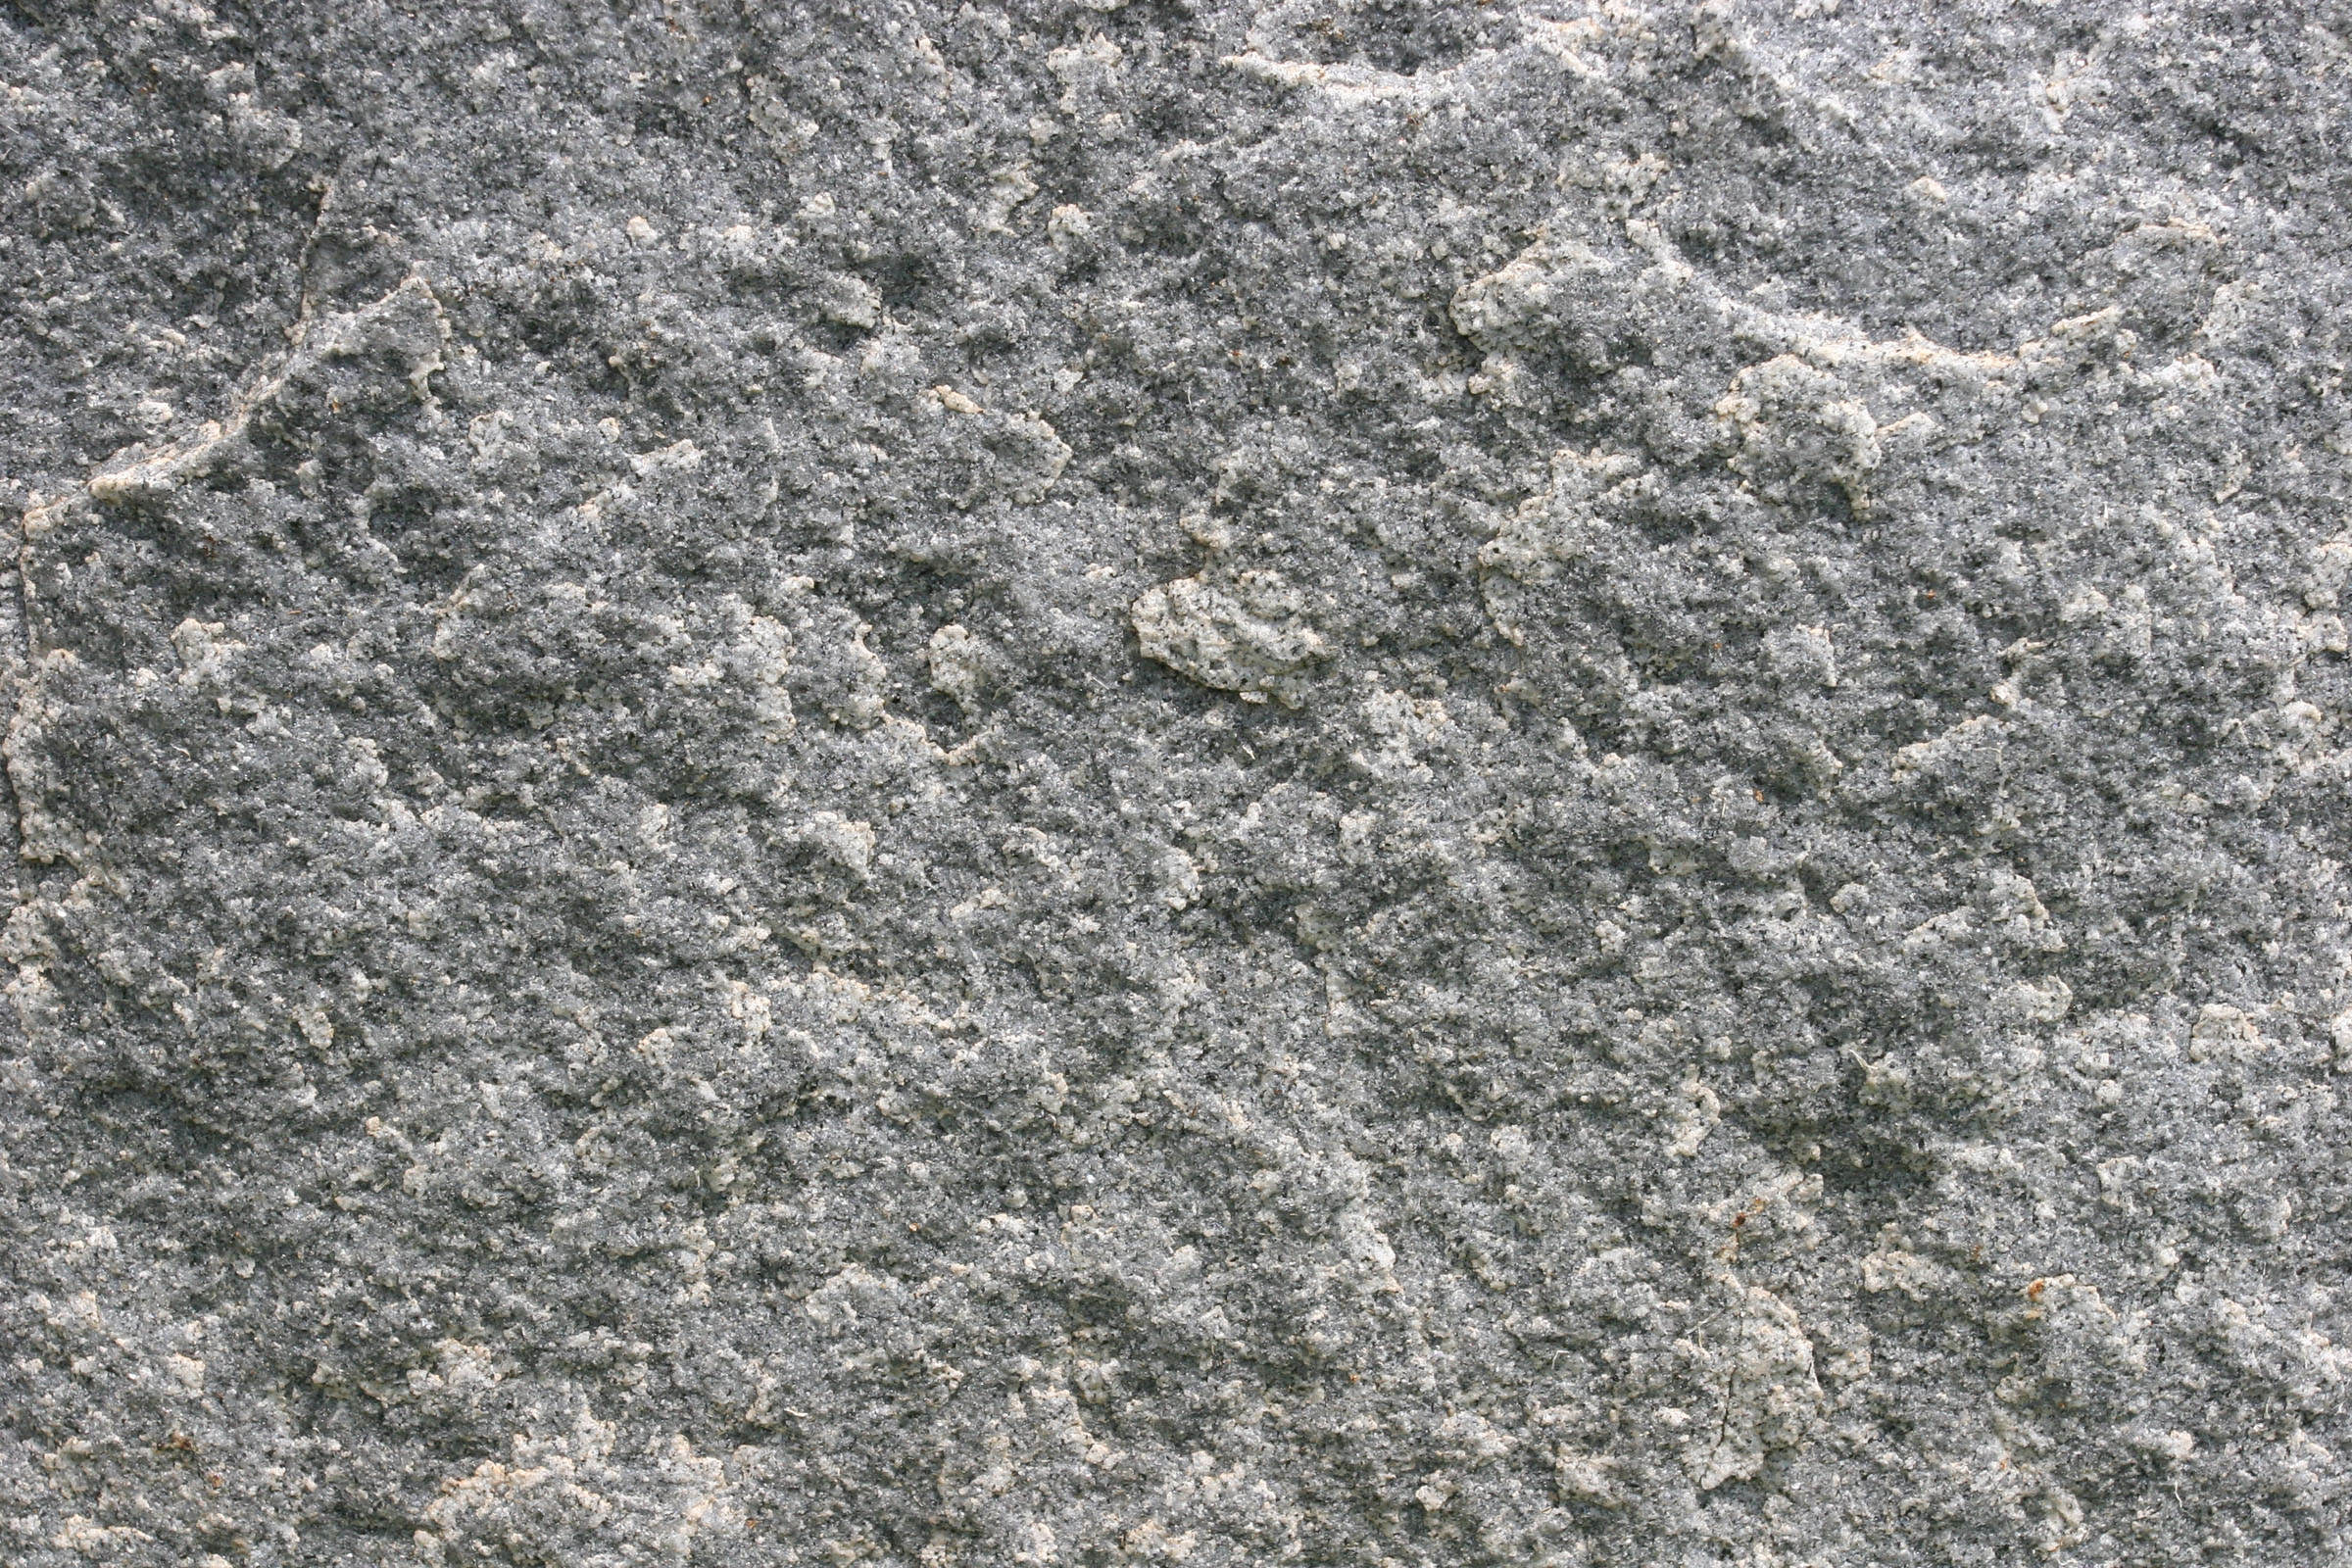 Stone texture wallpaper wallpapersafari for Stone wallpaper